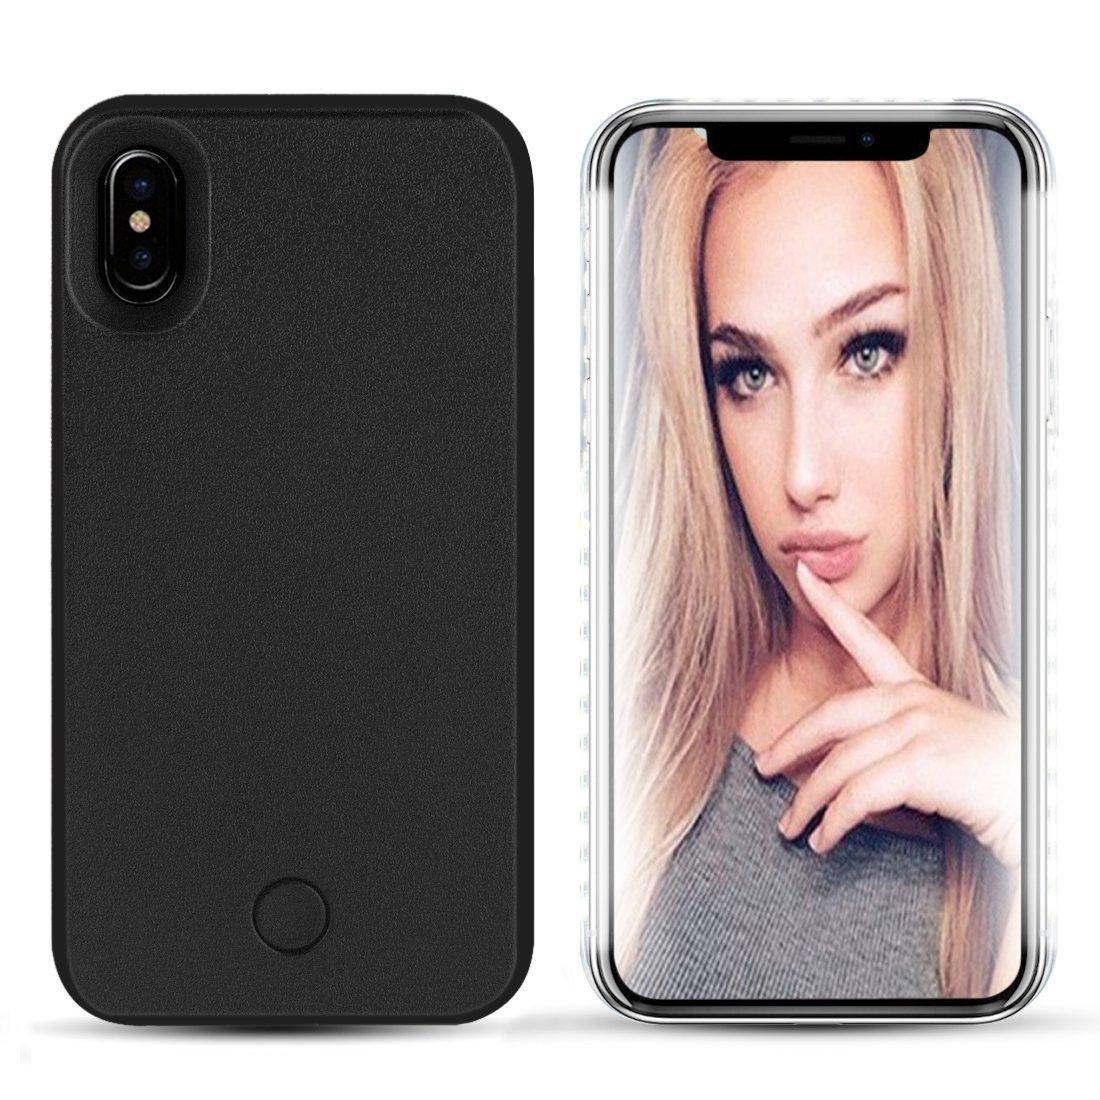 Avkkey iPhone XS MAX LED Caso iPhone XS MAX Selfie luz iPhone Caso Ideal para un Brillante Selfie y FaceTime Iluminado luz Up Carcasa para iPhone XS MAX 6.5''-Negro